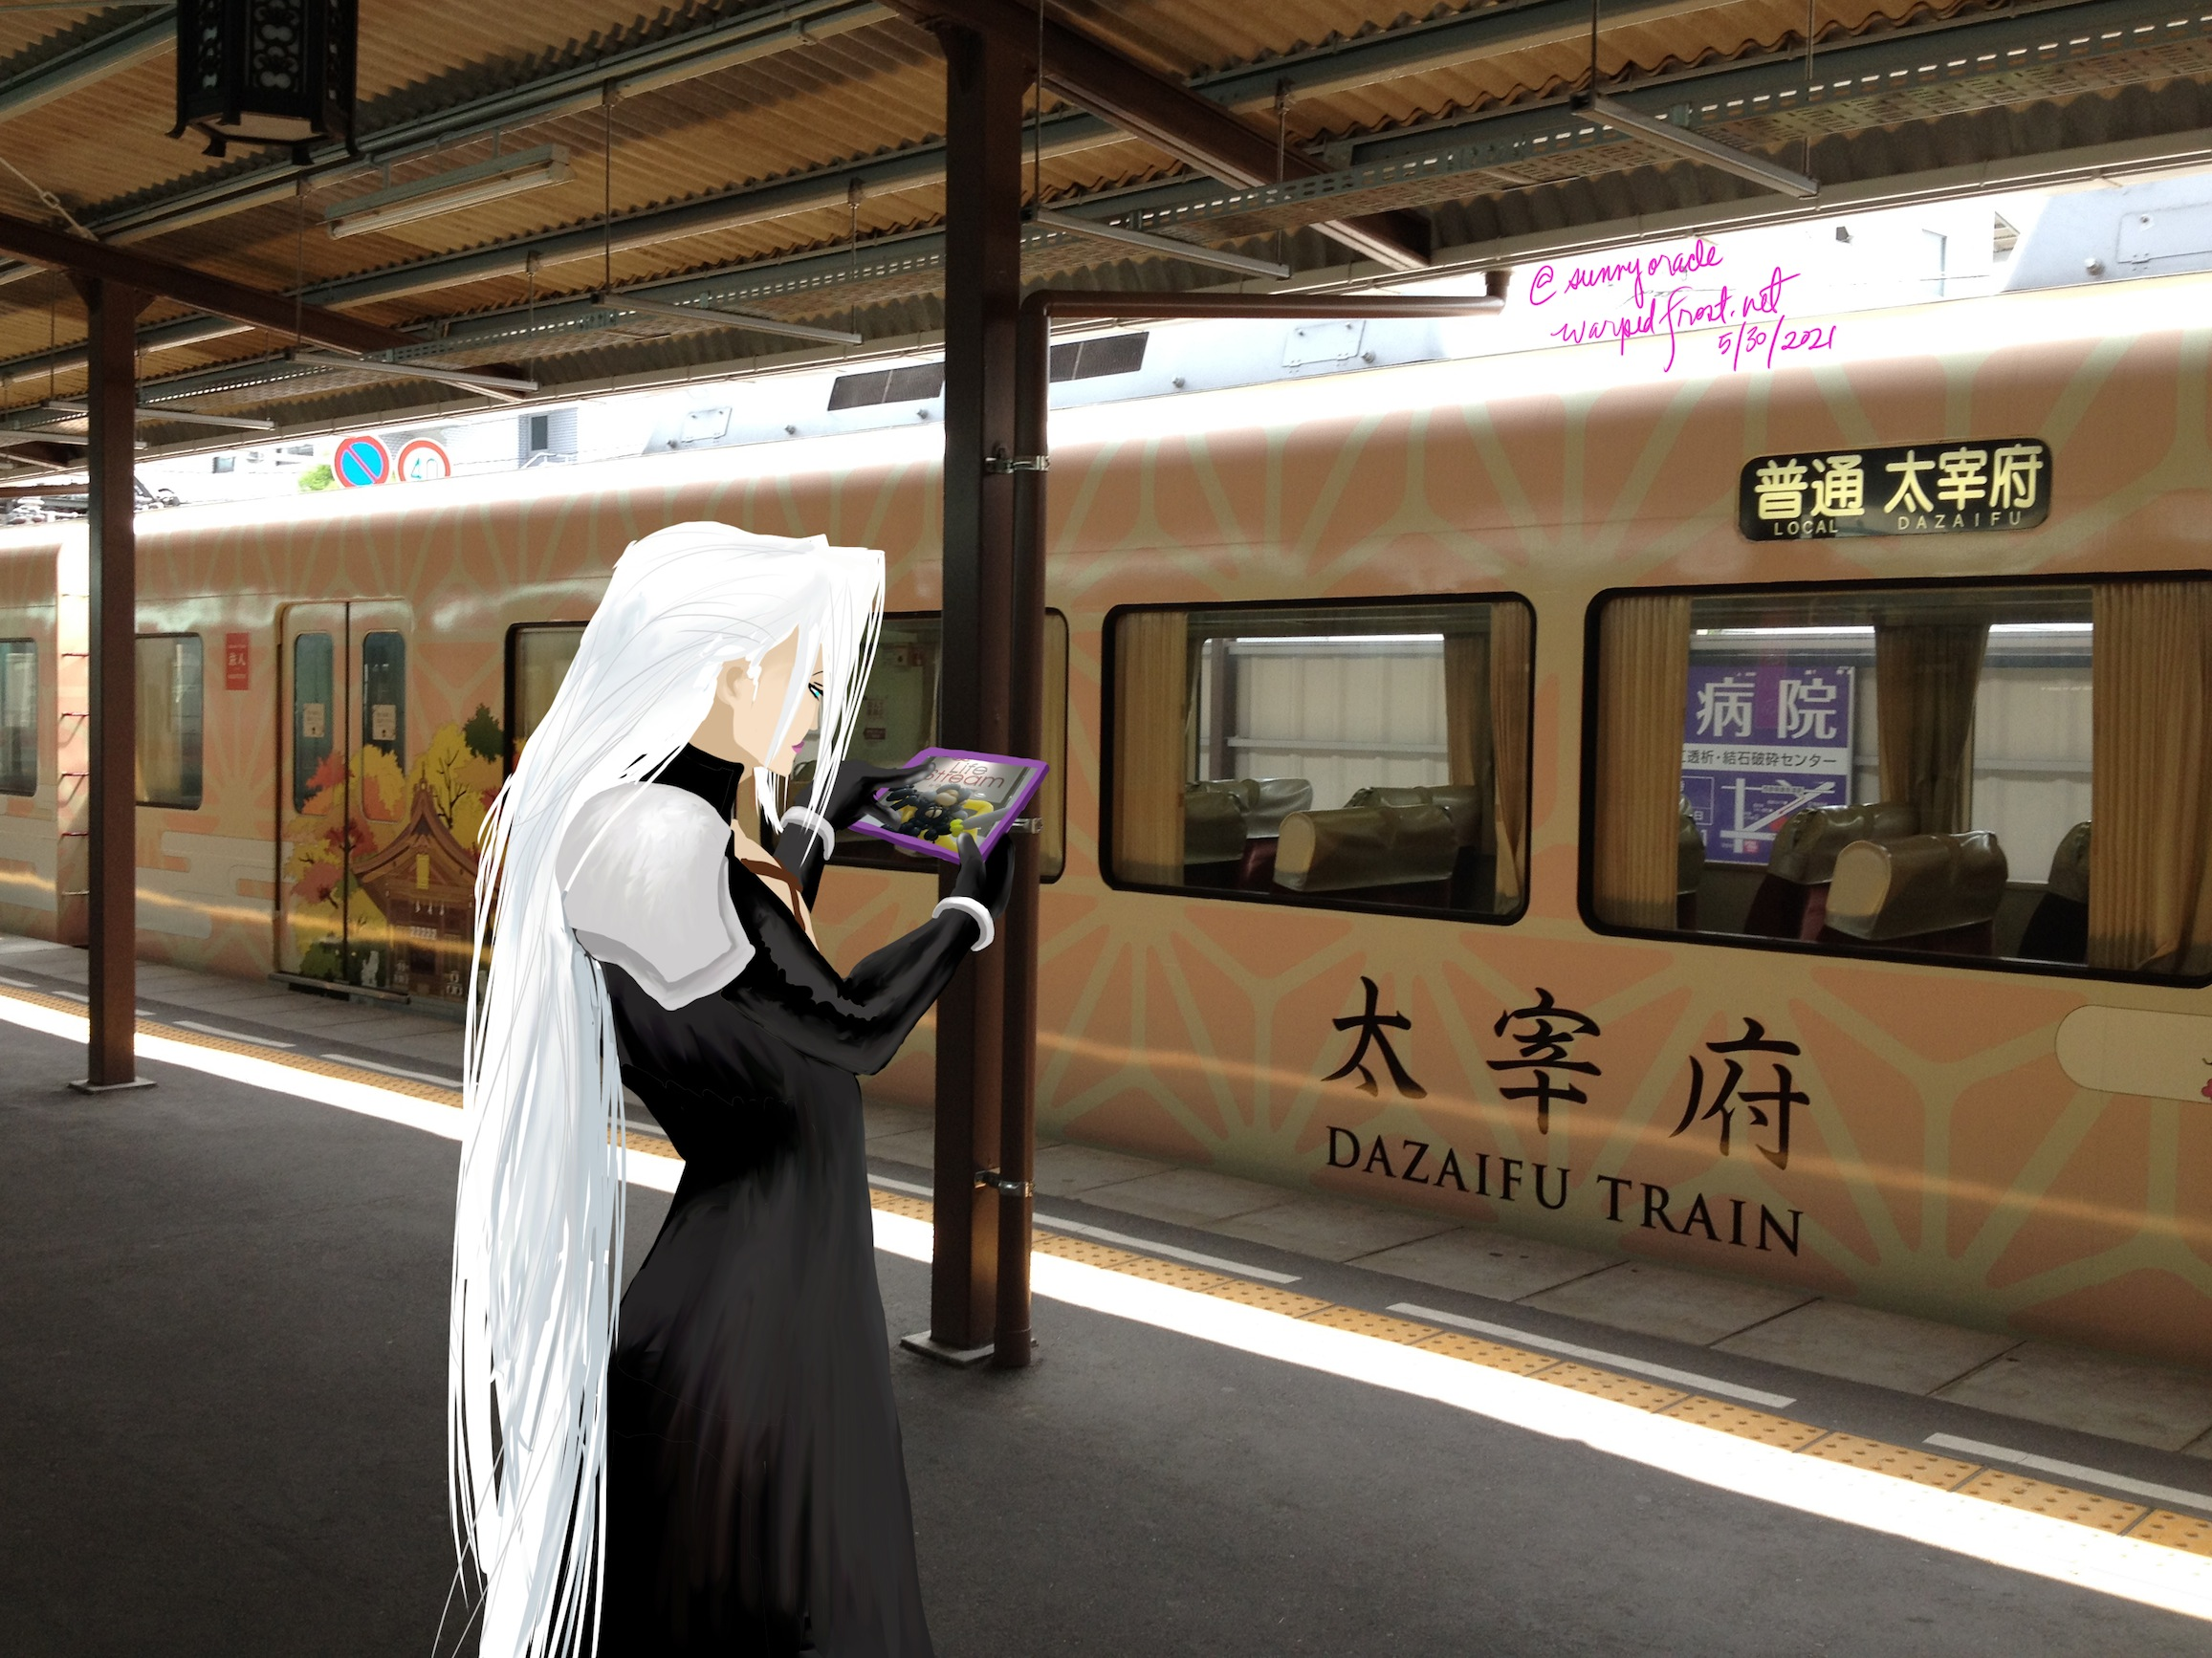 Dazaifu Train Seph